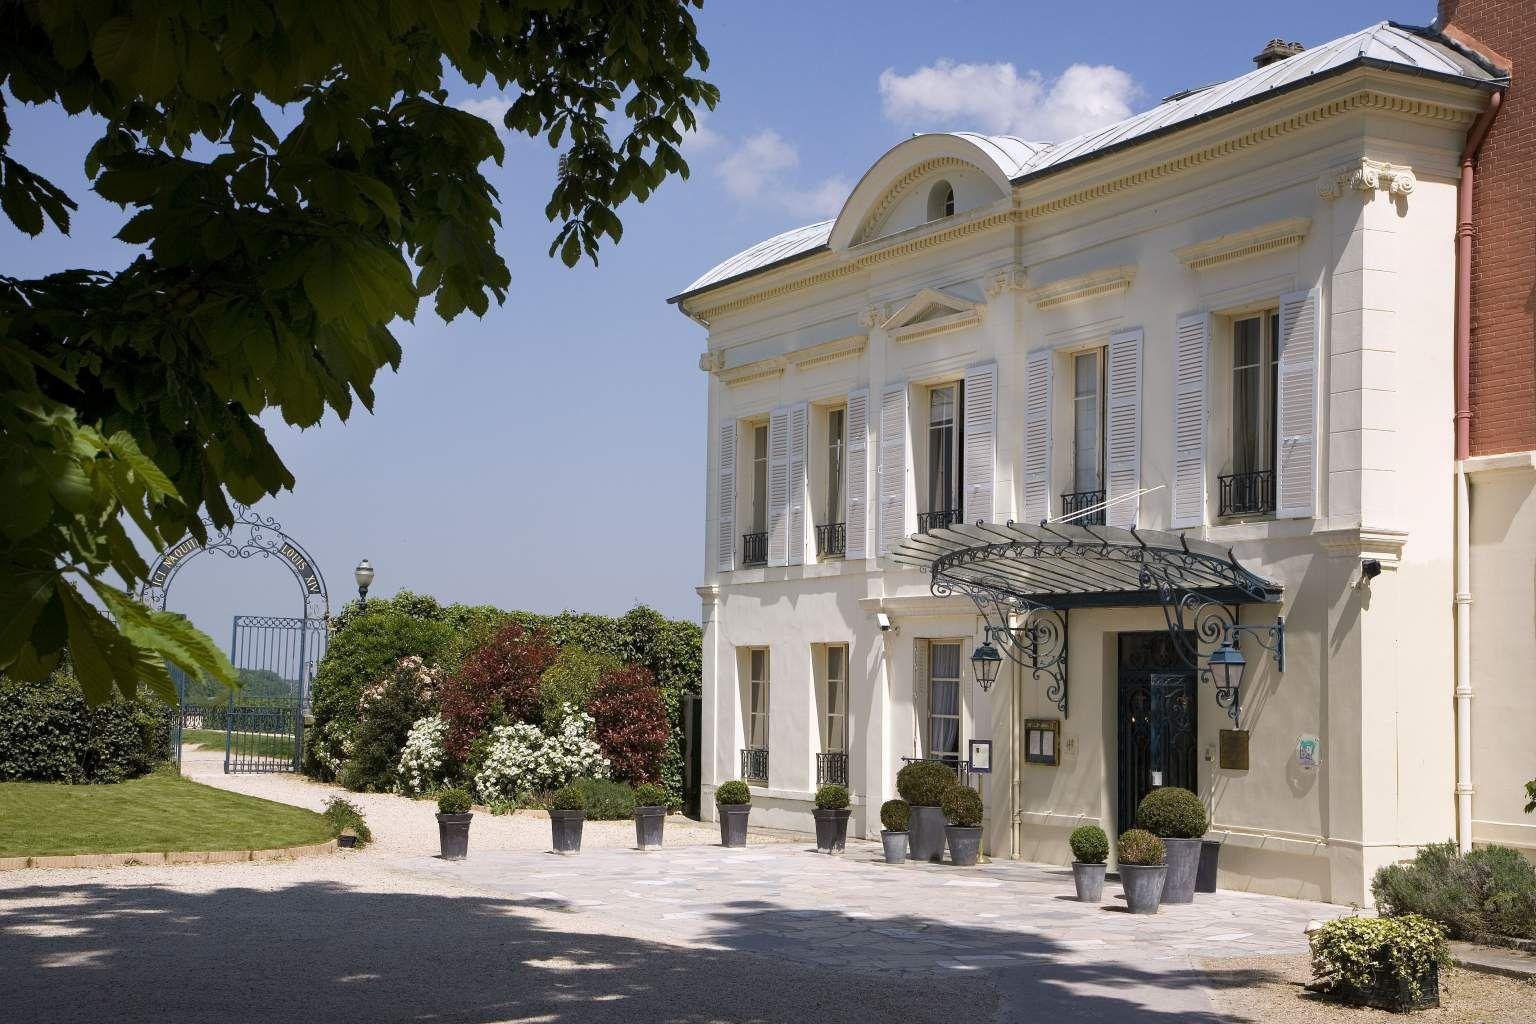 Pavillon Henri 4 Hotel Hotel Saint Germain En Laye Official